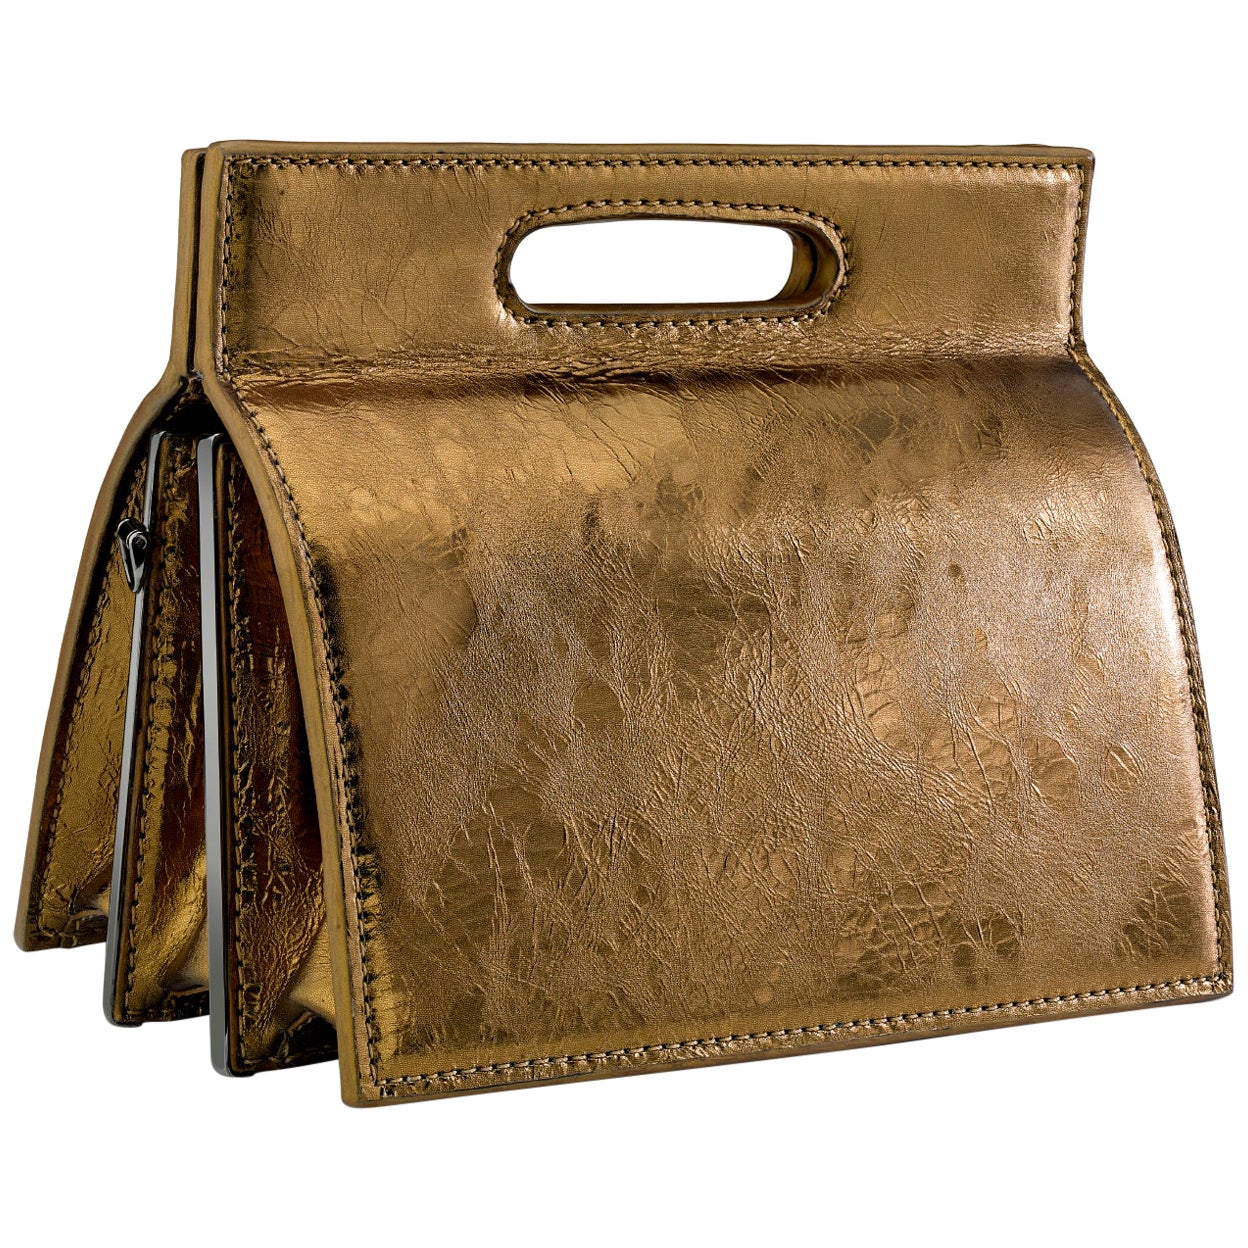 TYLER ELLIS Stella Handbag Petite Bronze Antiqued Leather Gunmetal Hardware